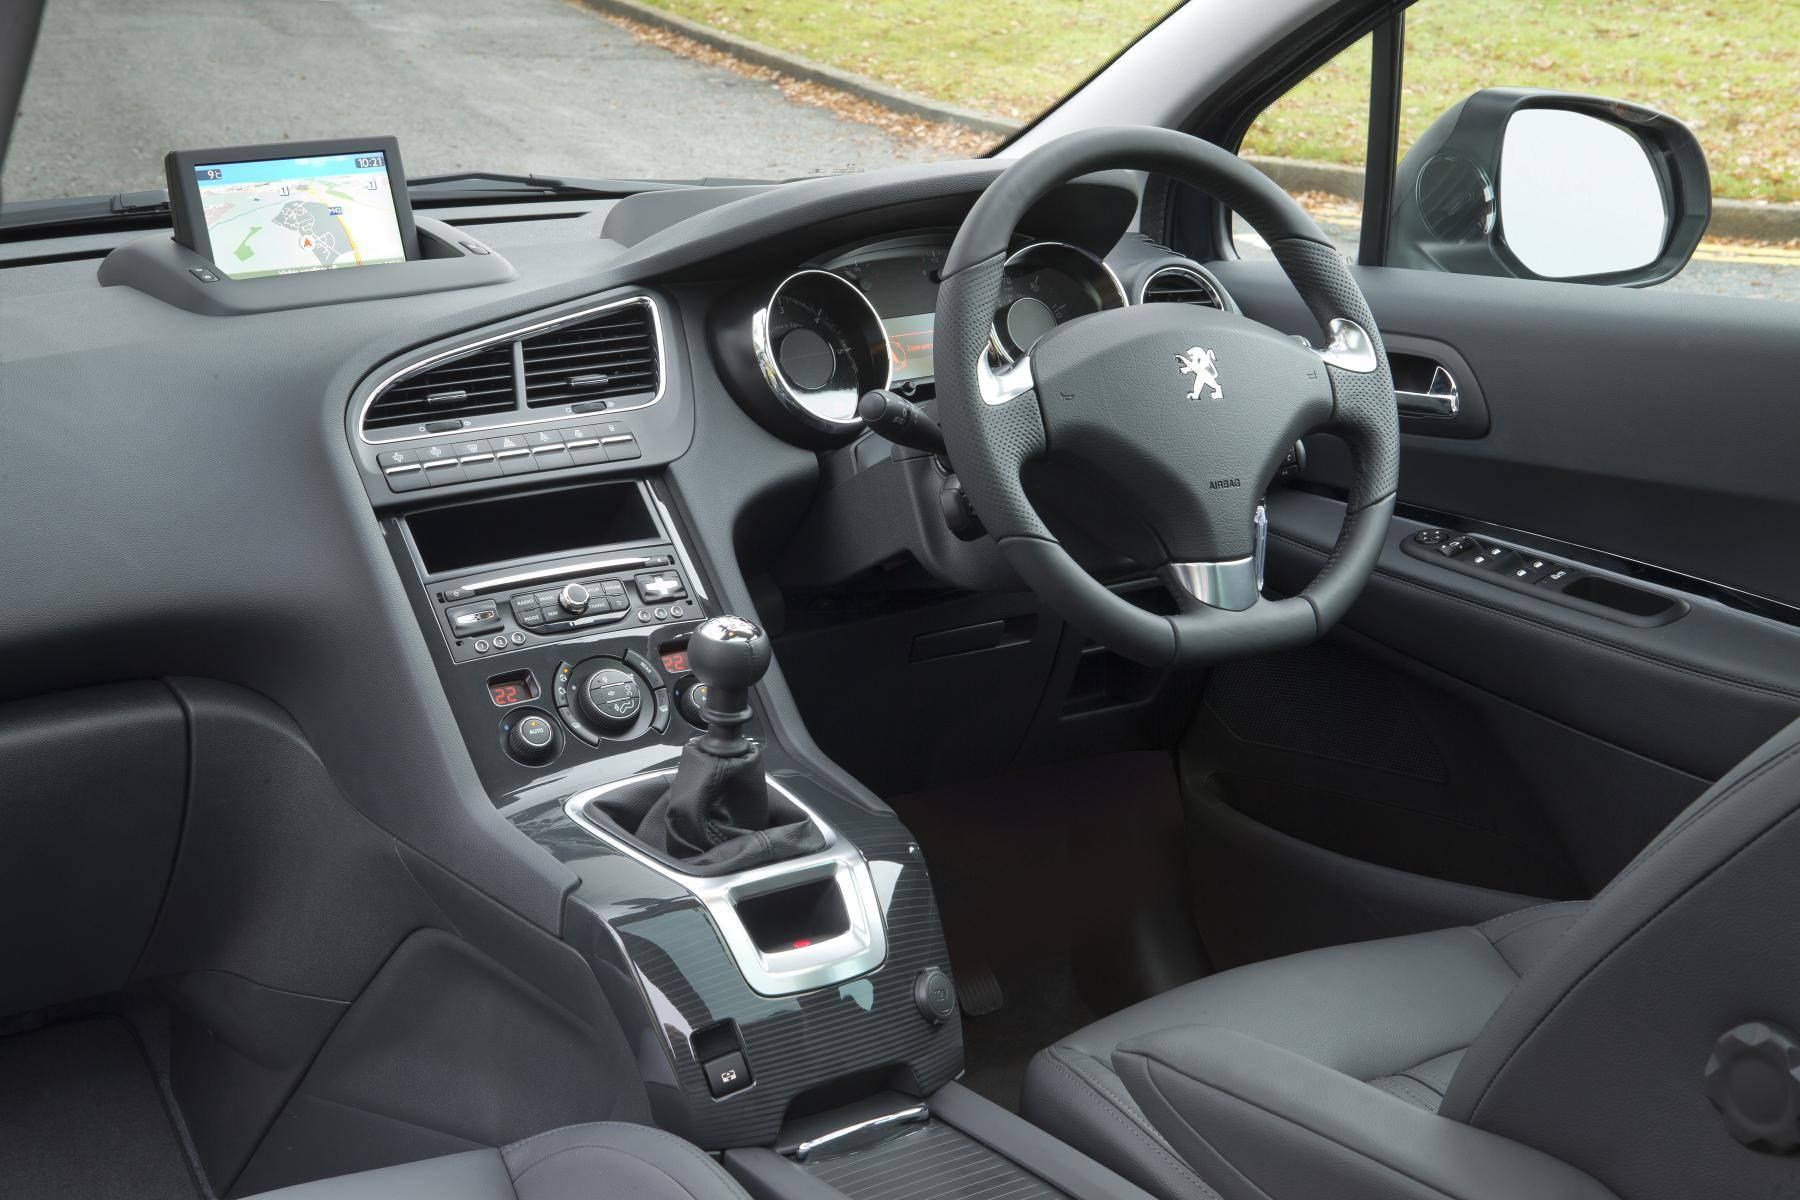 image of a peugeot 5008 car interior